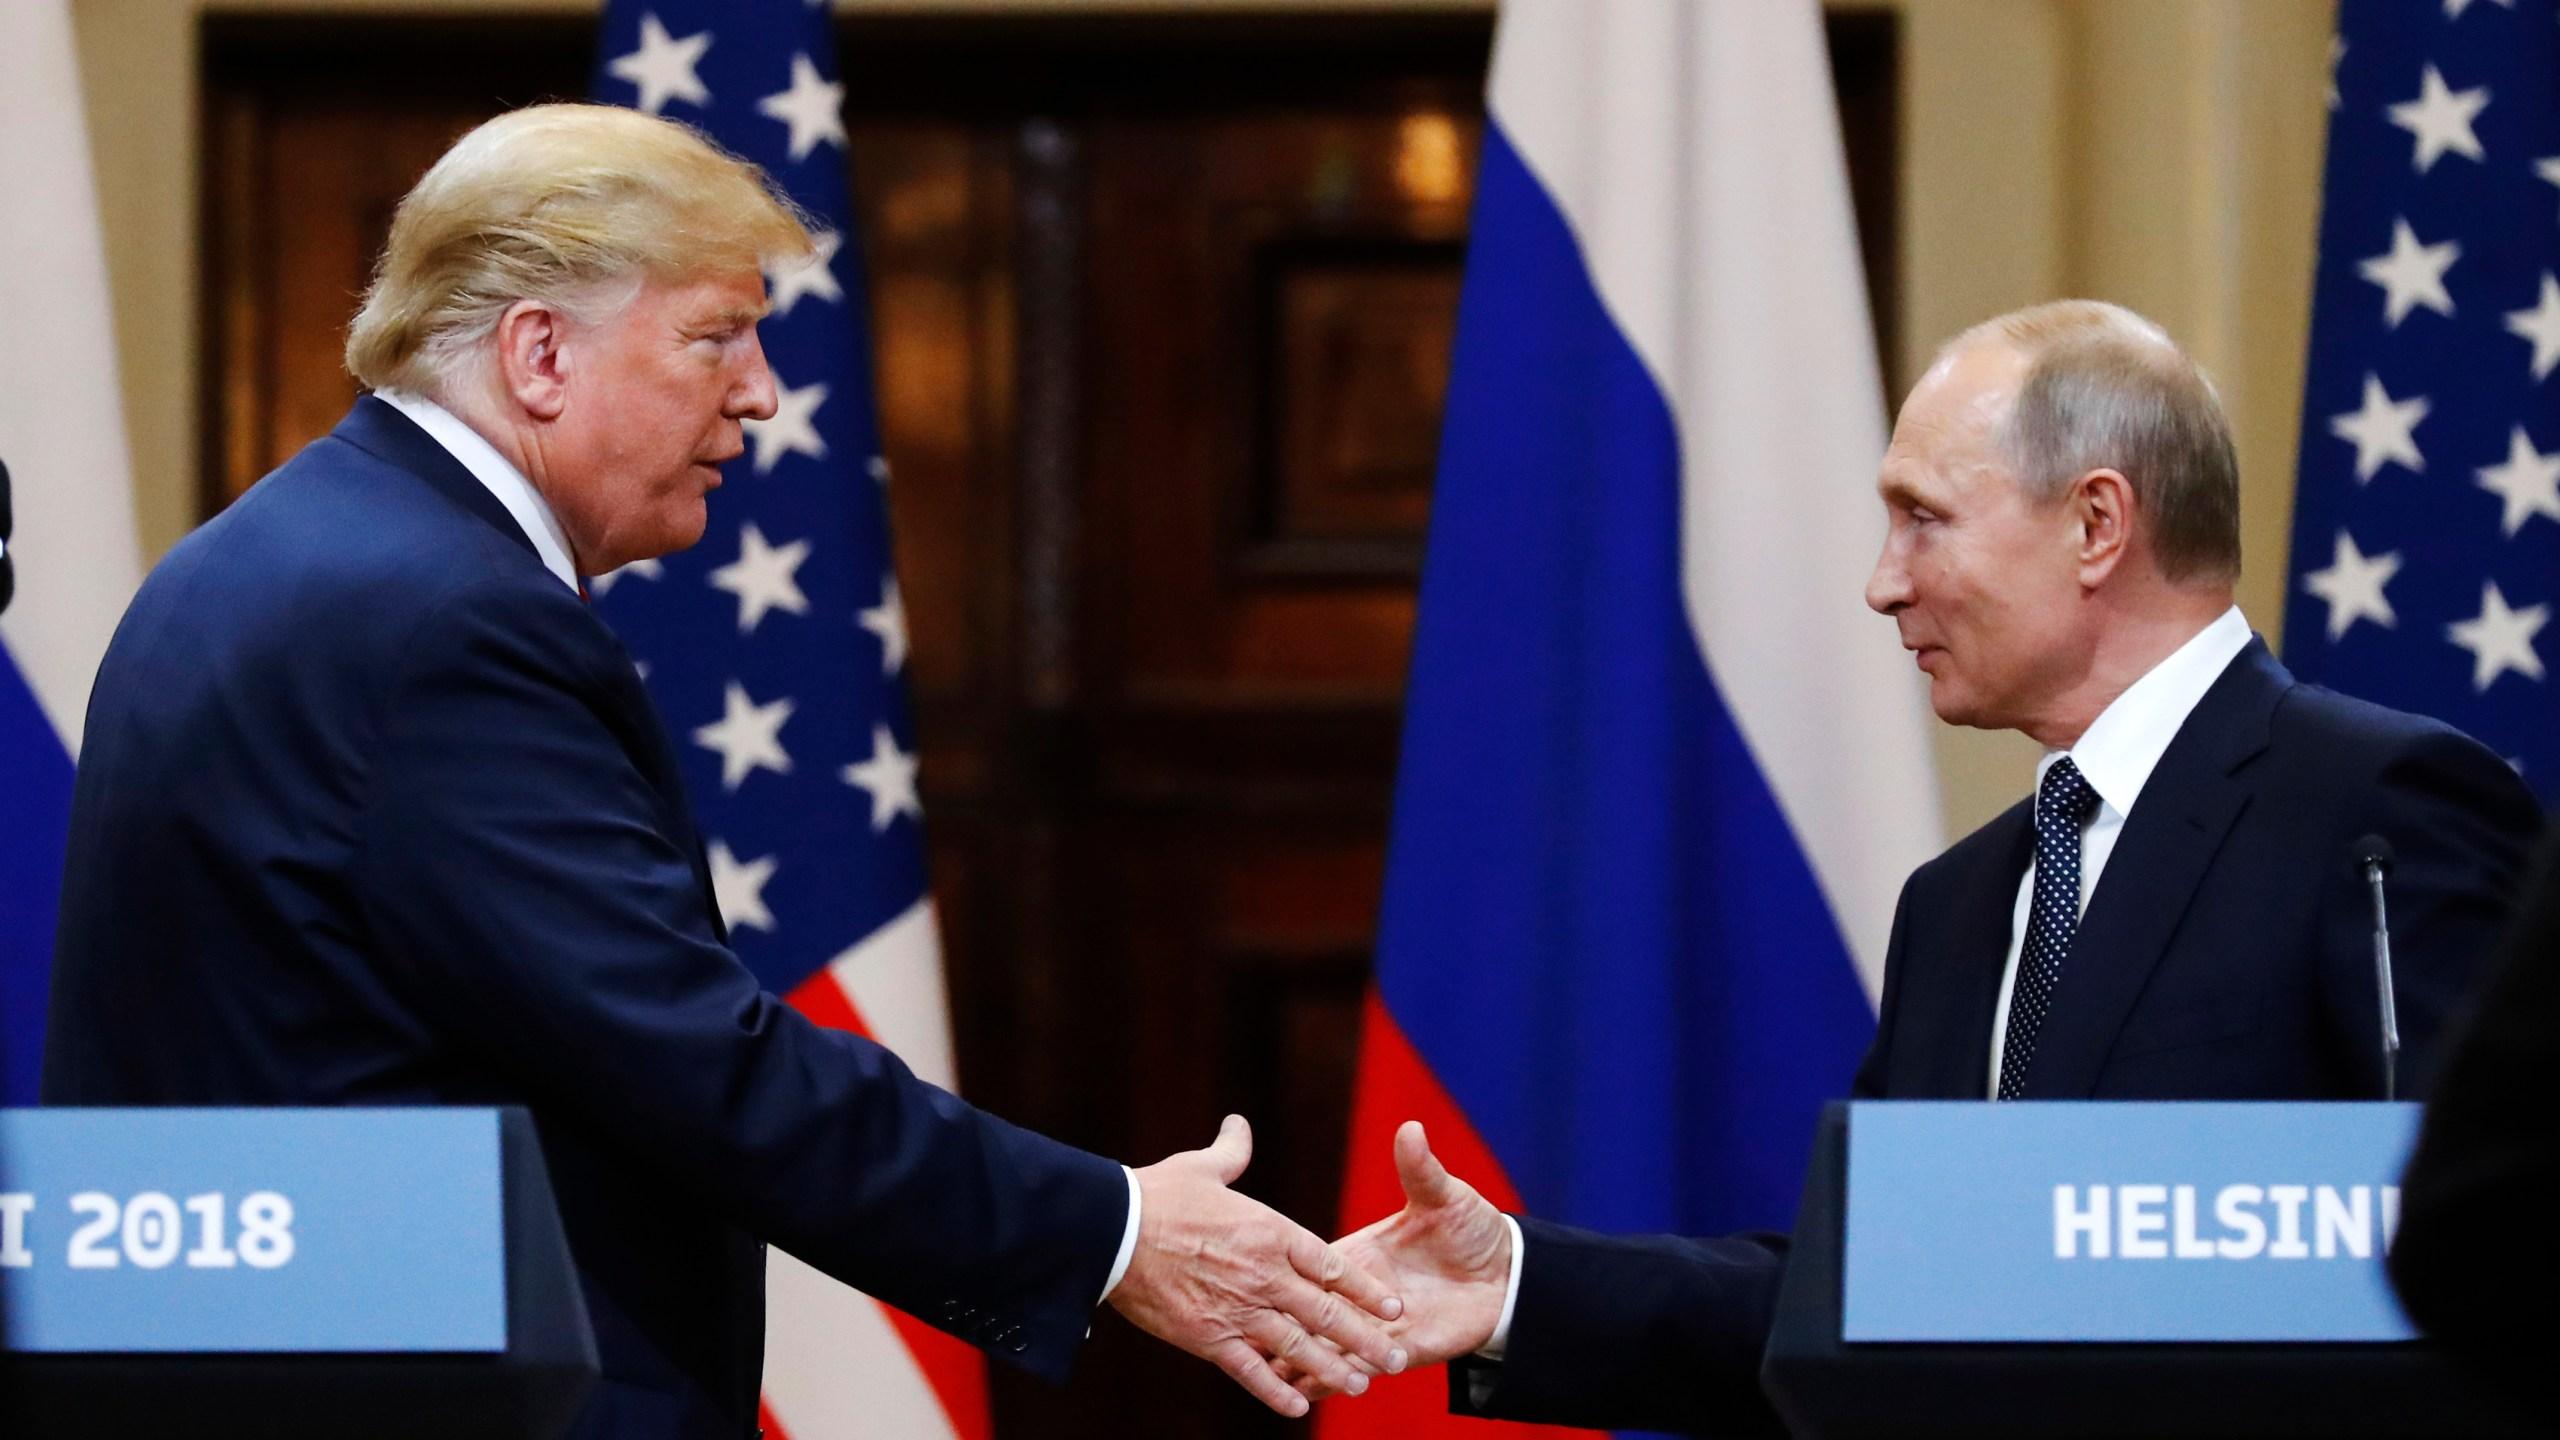 APTOPIX_Finland_Trump_Putin_Summit_66350-159532.jpg06521894